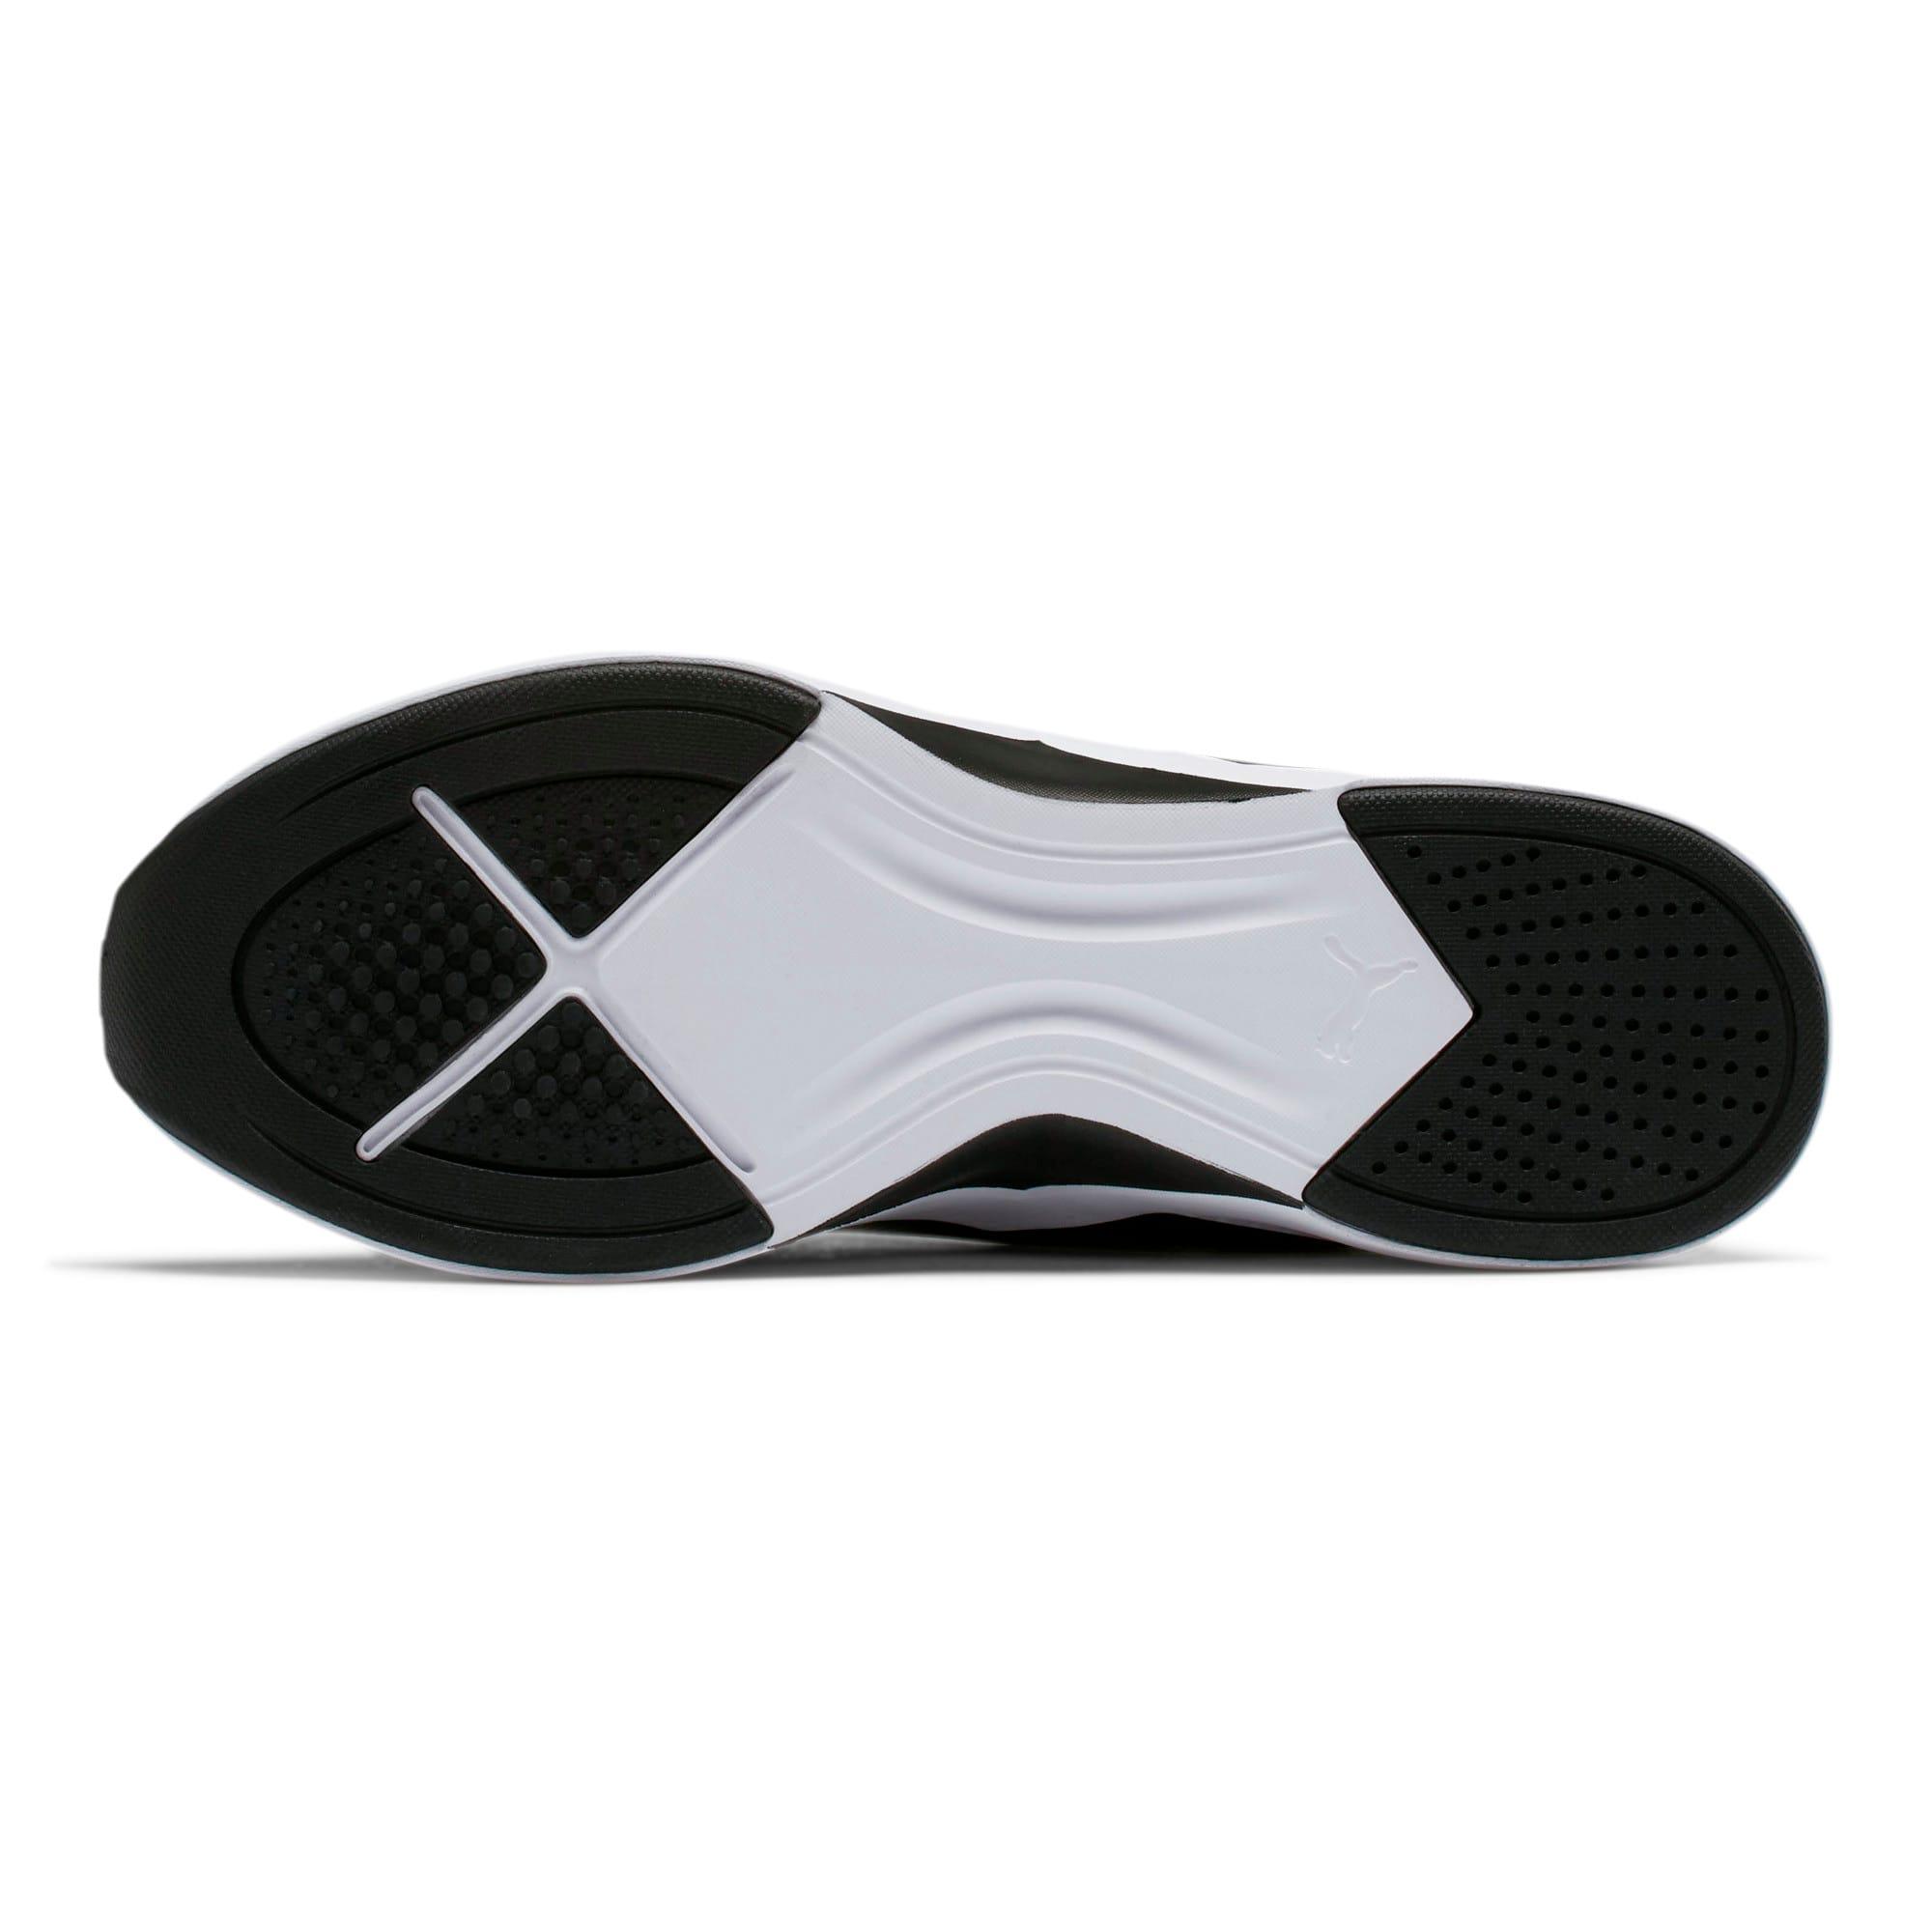 Thumbnail 5 of Incite FS Shift Women's Training Shoes, Puma Black-Nrgy Rose, medium